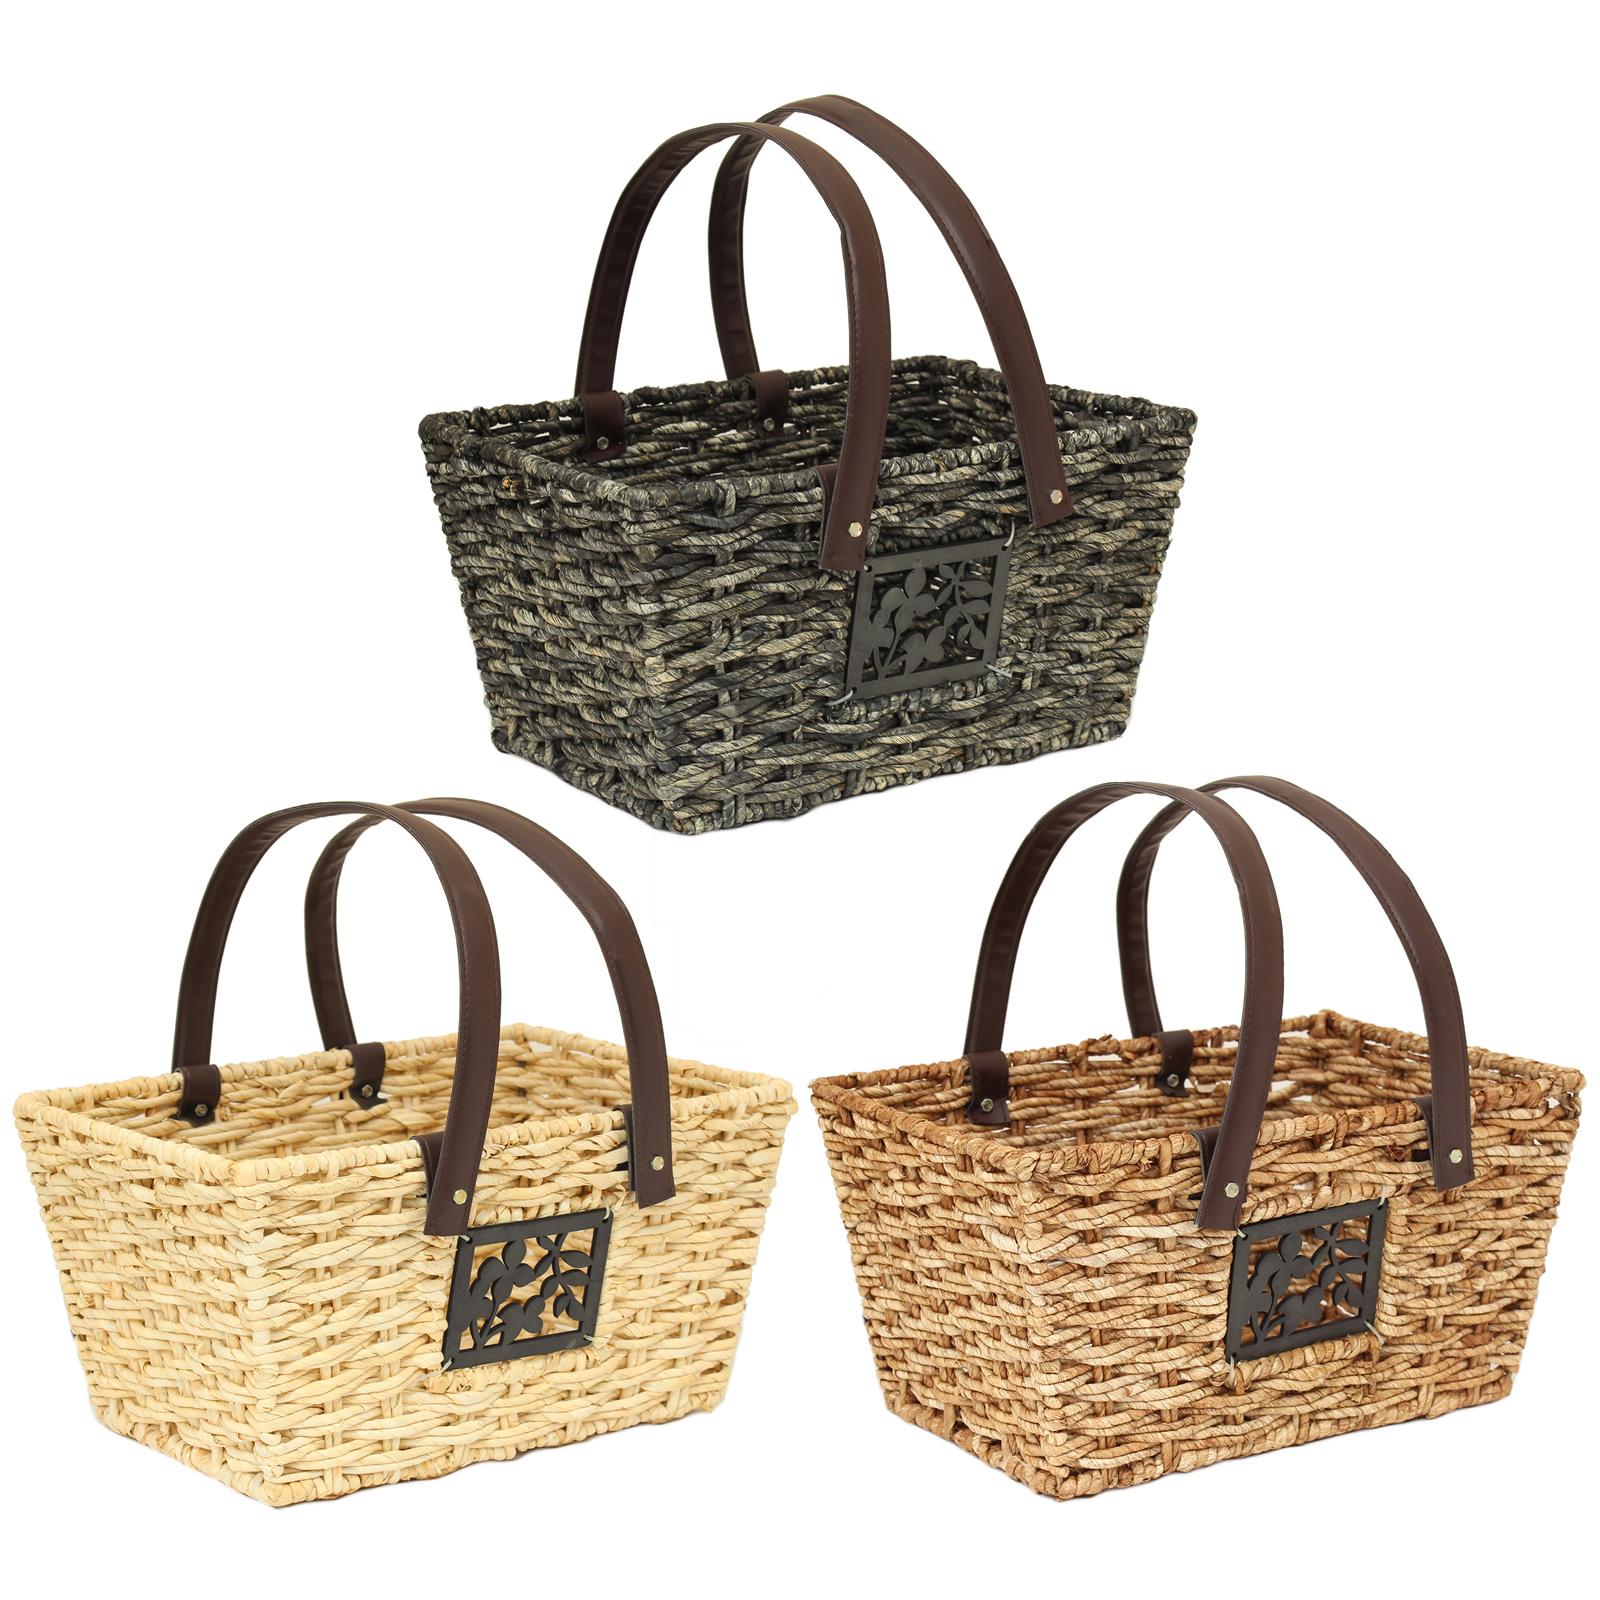 Woven Shopping Basket Uk : Large woven ping storage basket with handles kitchen